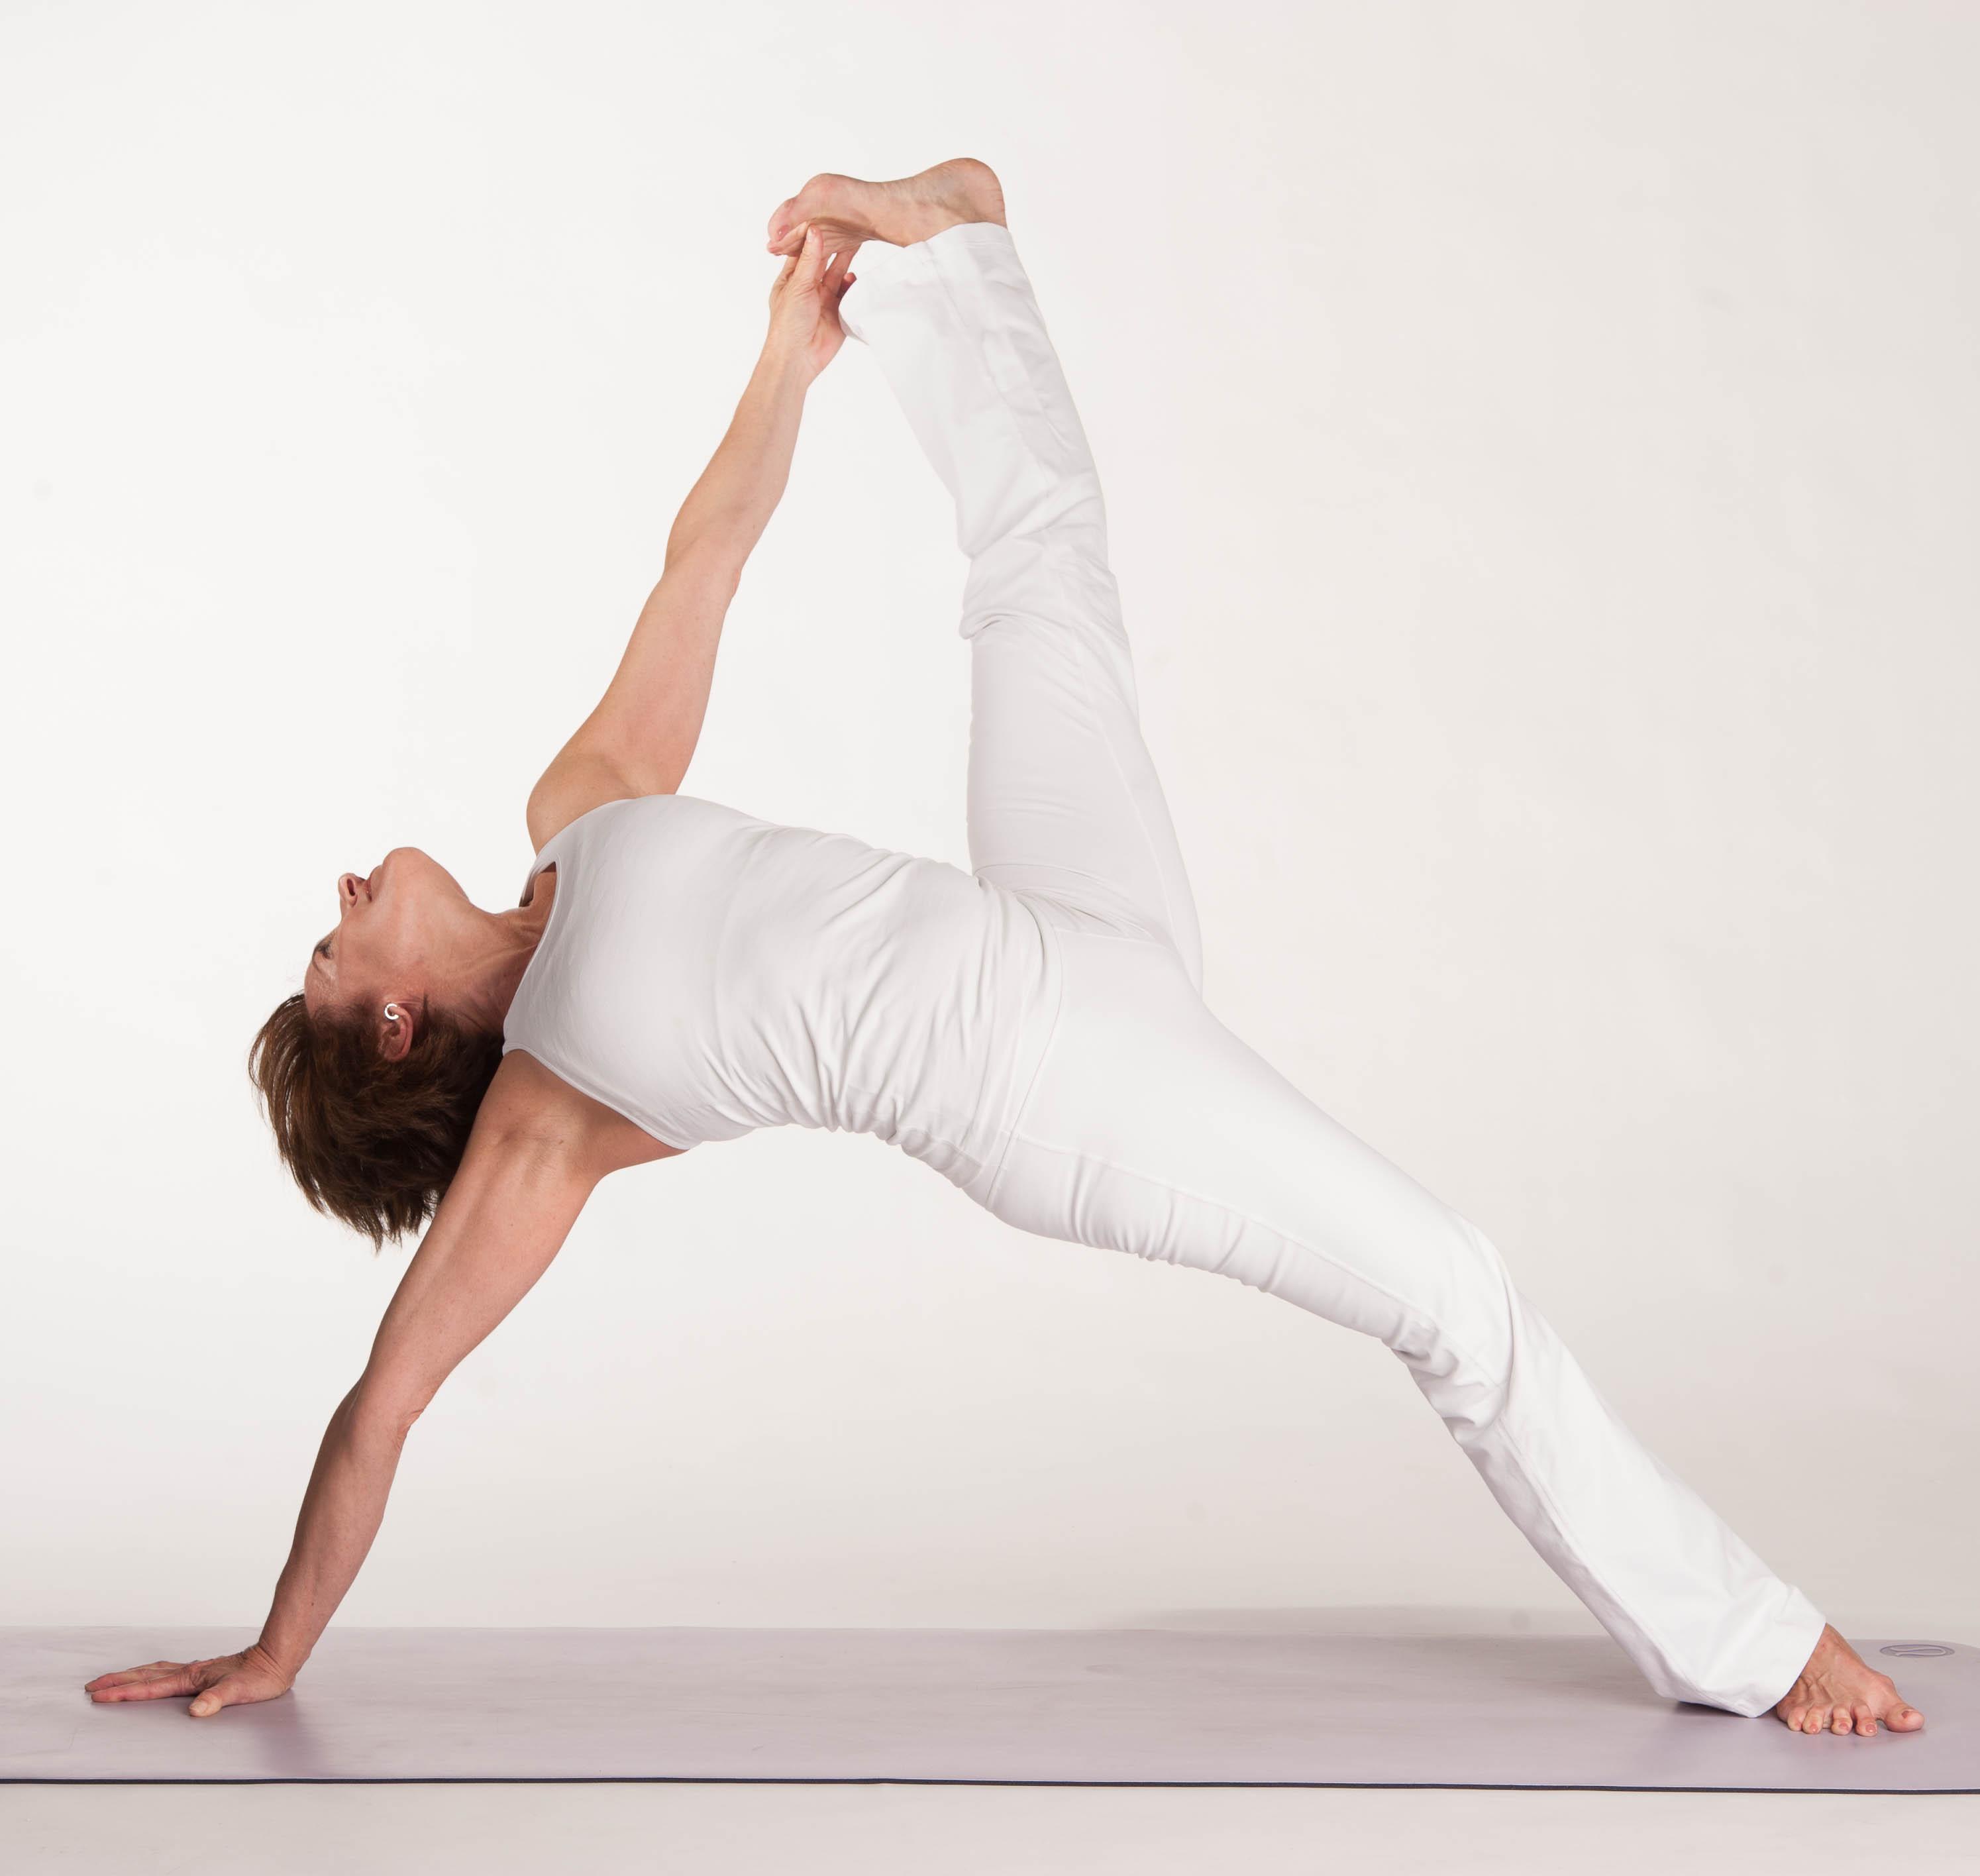 Advanced Yoga Moves That Strengthen Your Upper Body | POPSUGAR Fitness